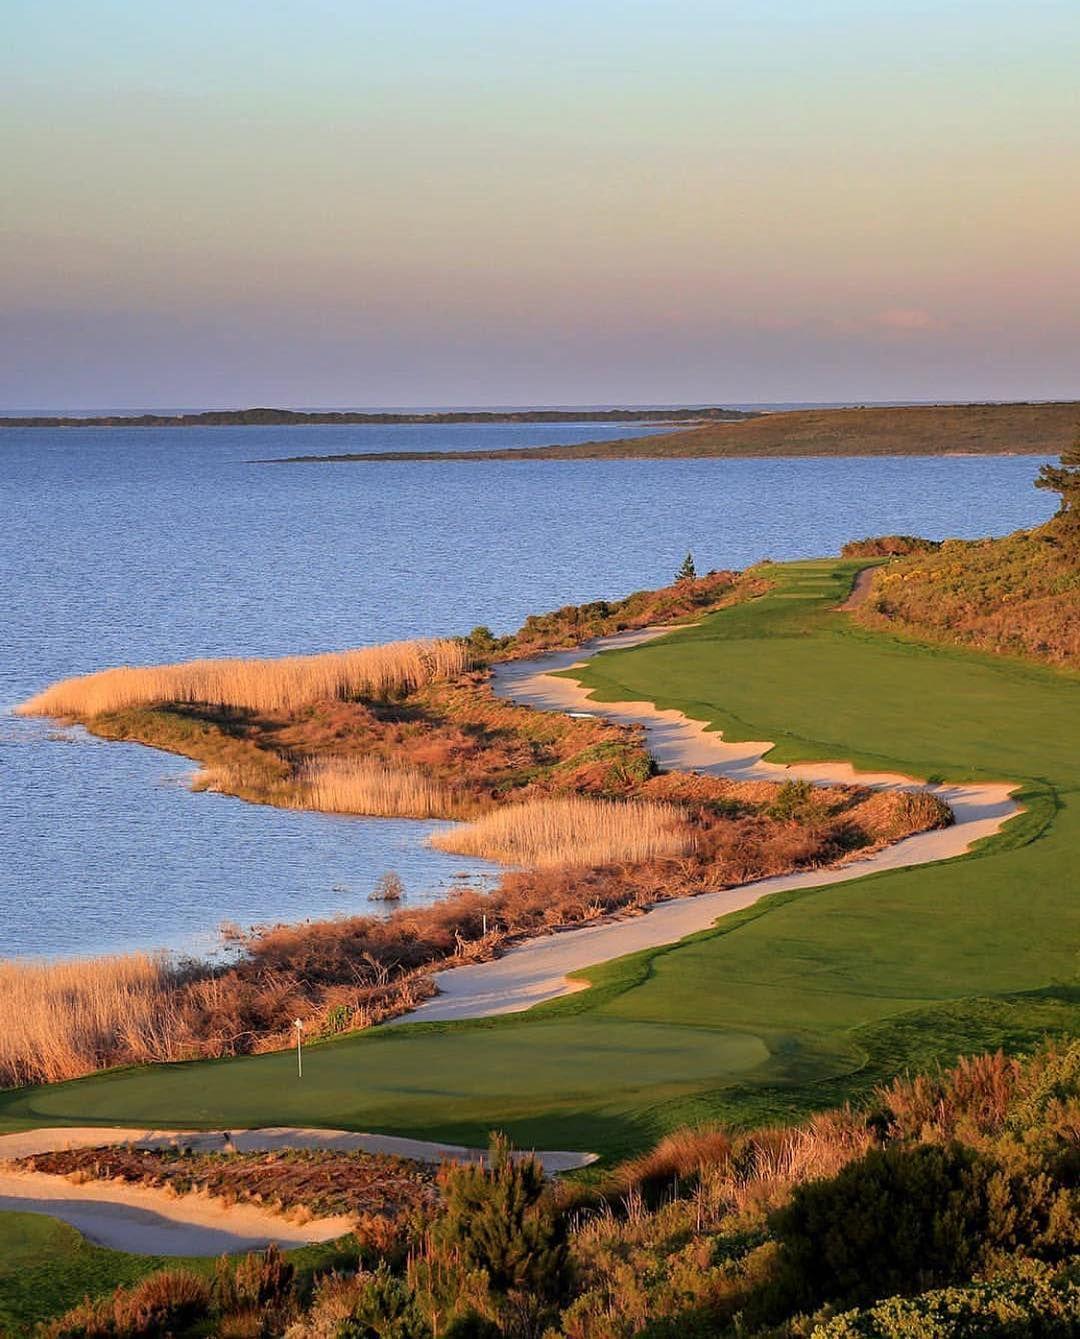 Épinglé sur Amazing golf around the world